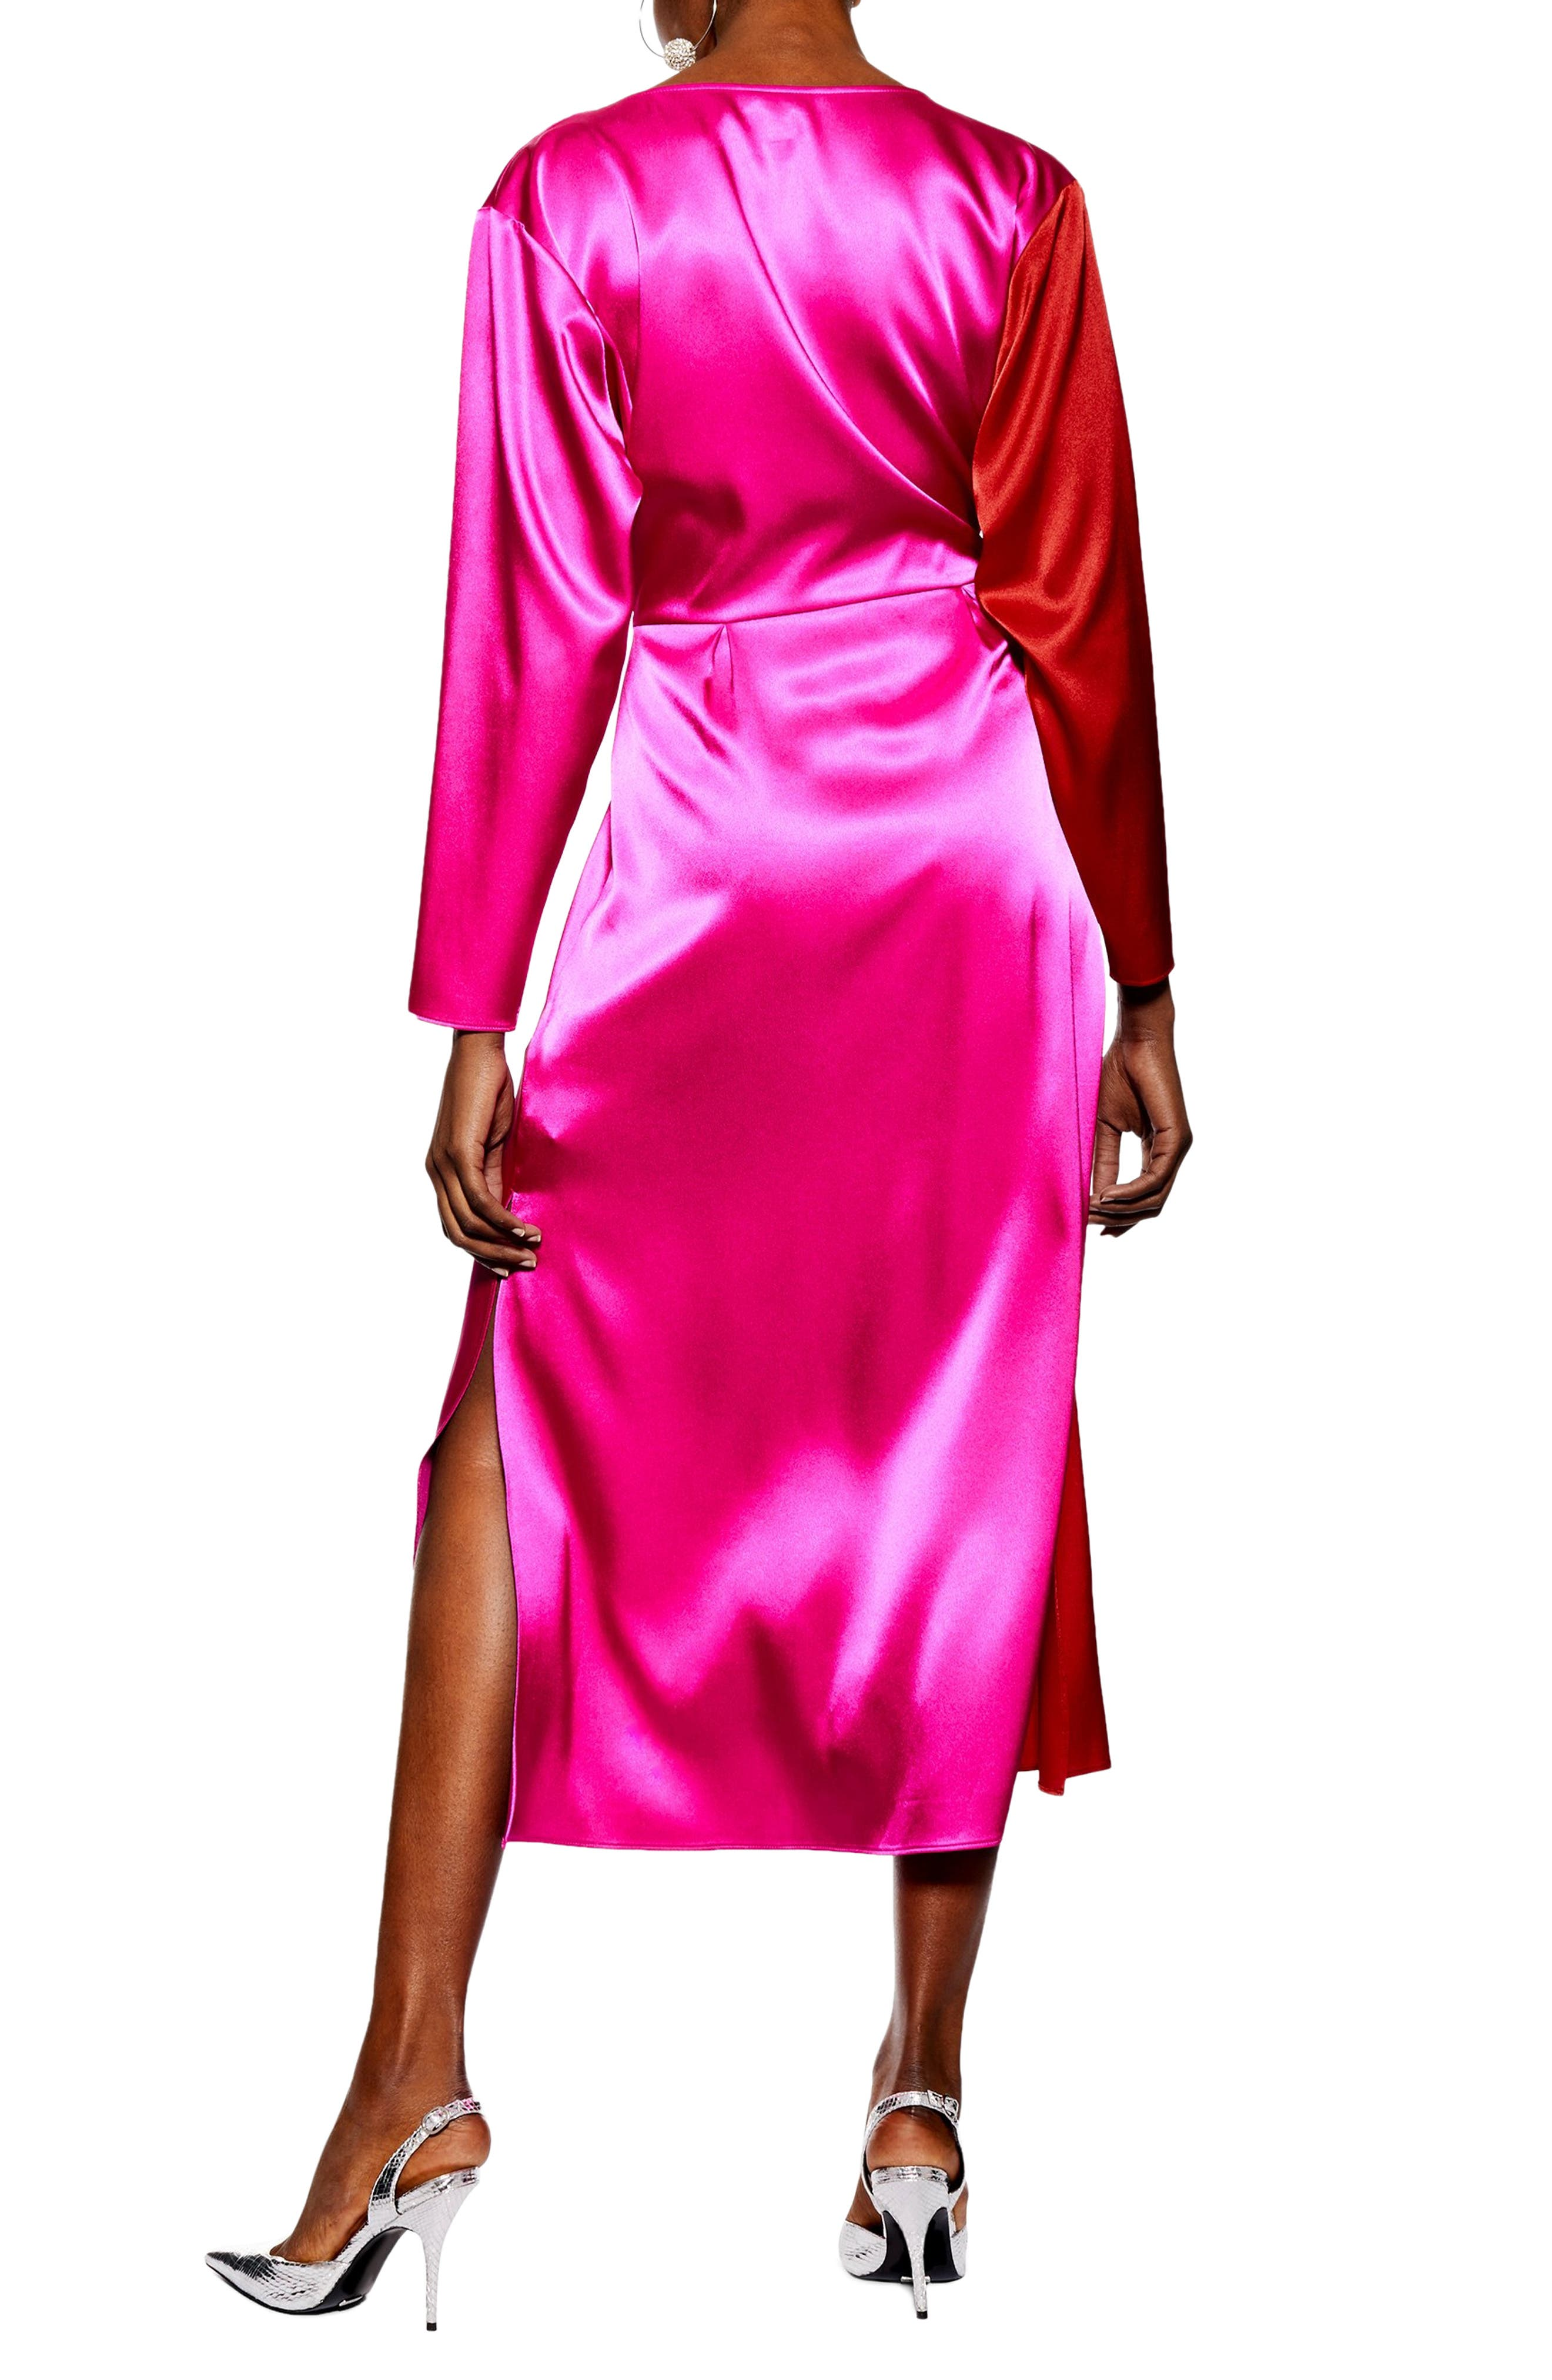 TOPSHOP,                             Colorblock Dress,                             Alternate thumbnail 2, color,                             PINK MULTI